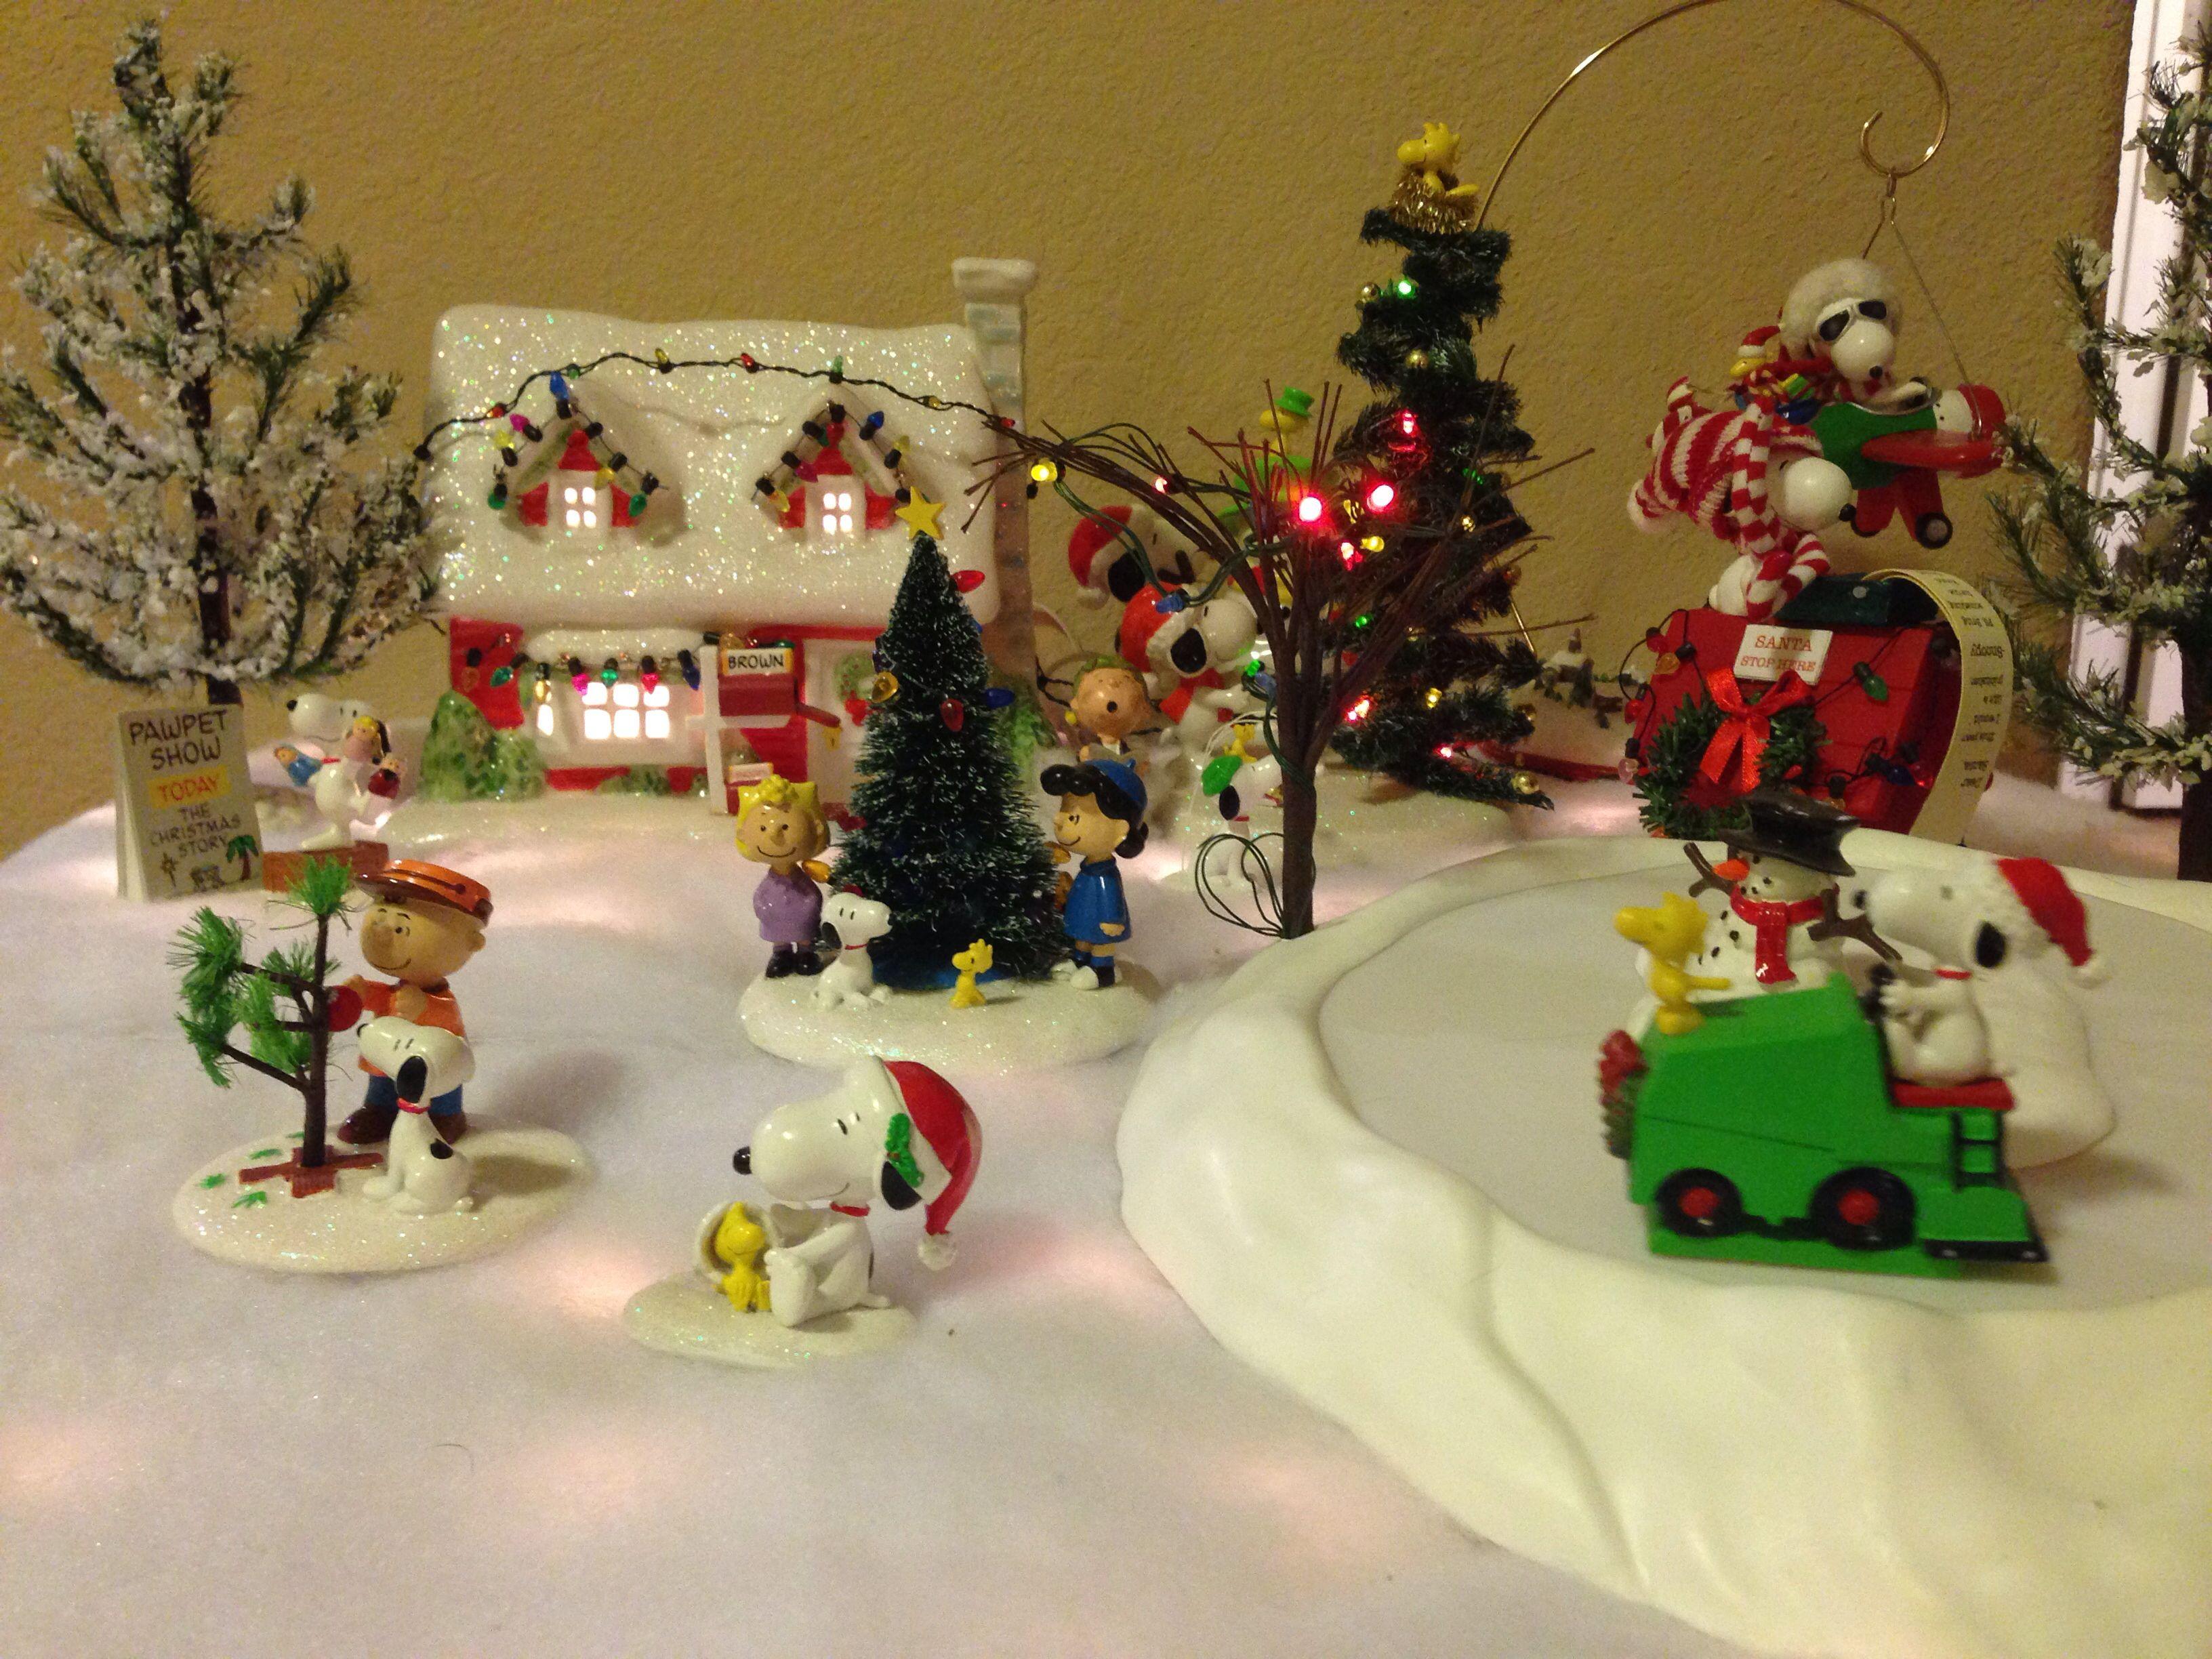 Peanuts Christmas Village | My Villages | Pinterest | Peanuts ...